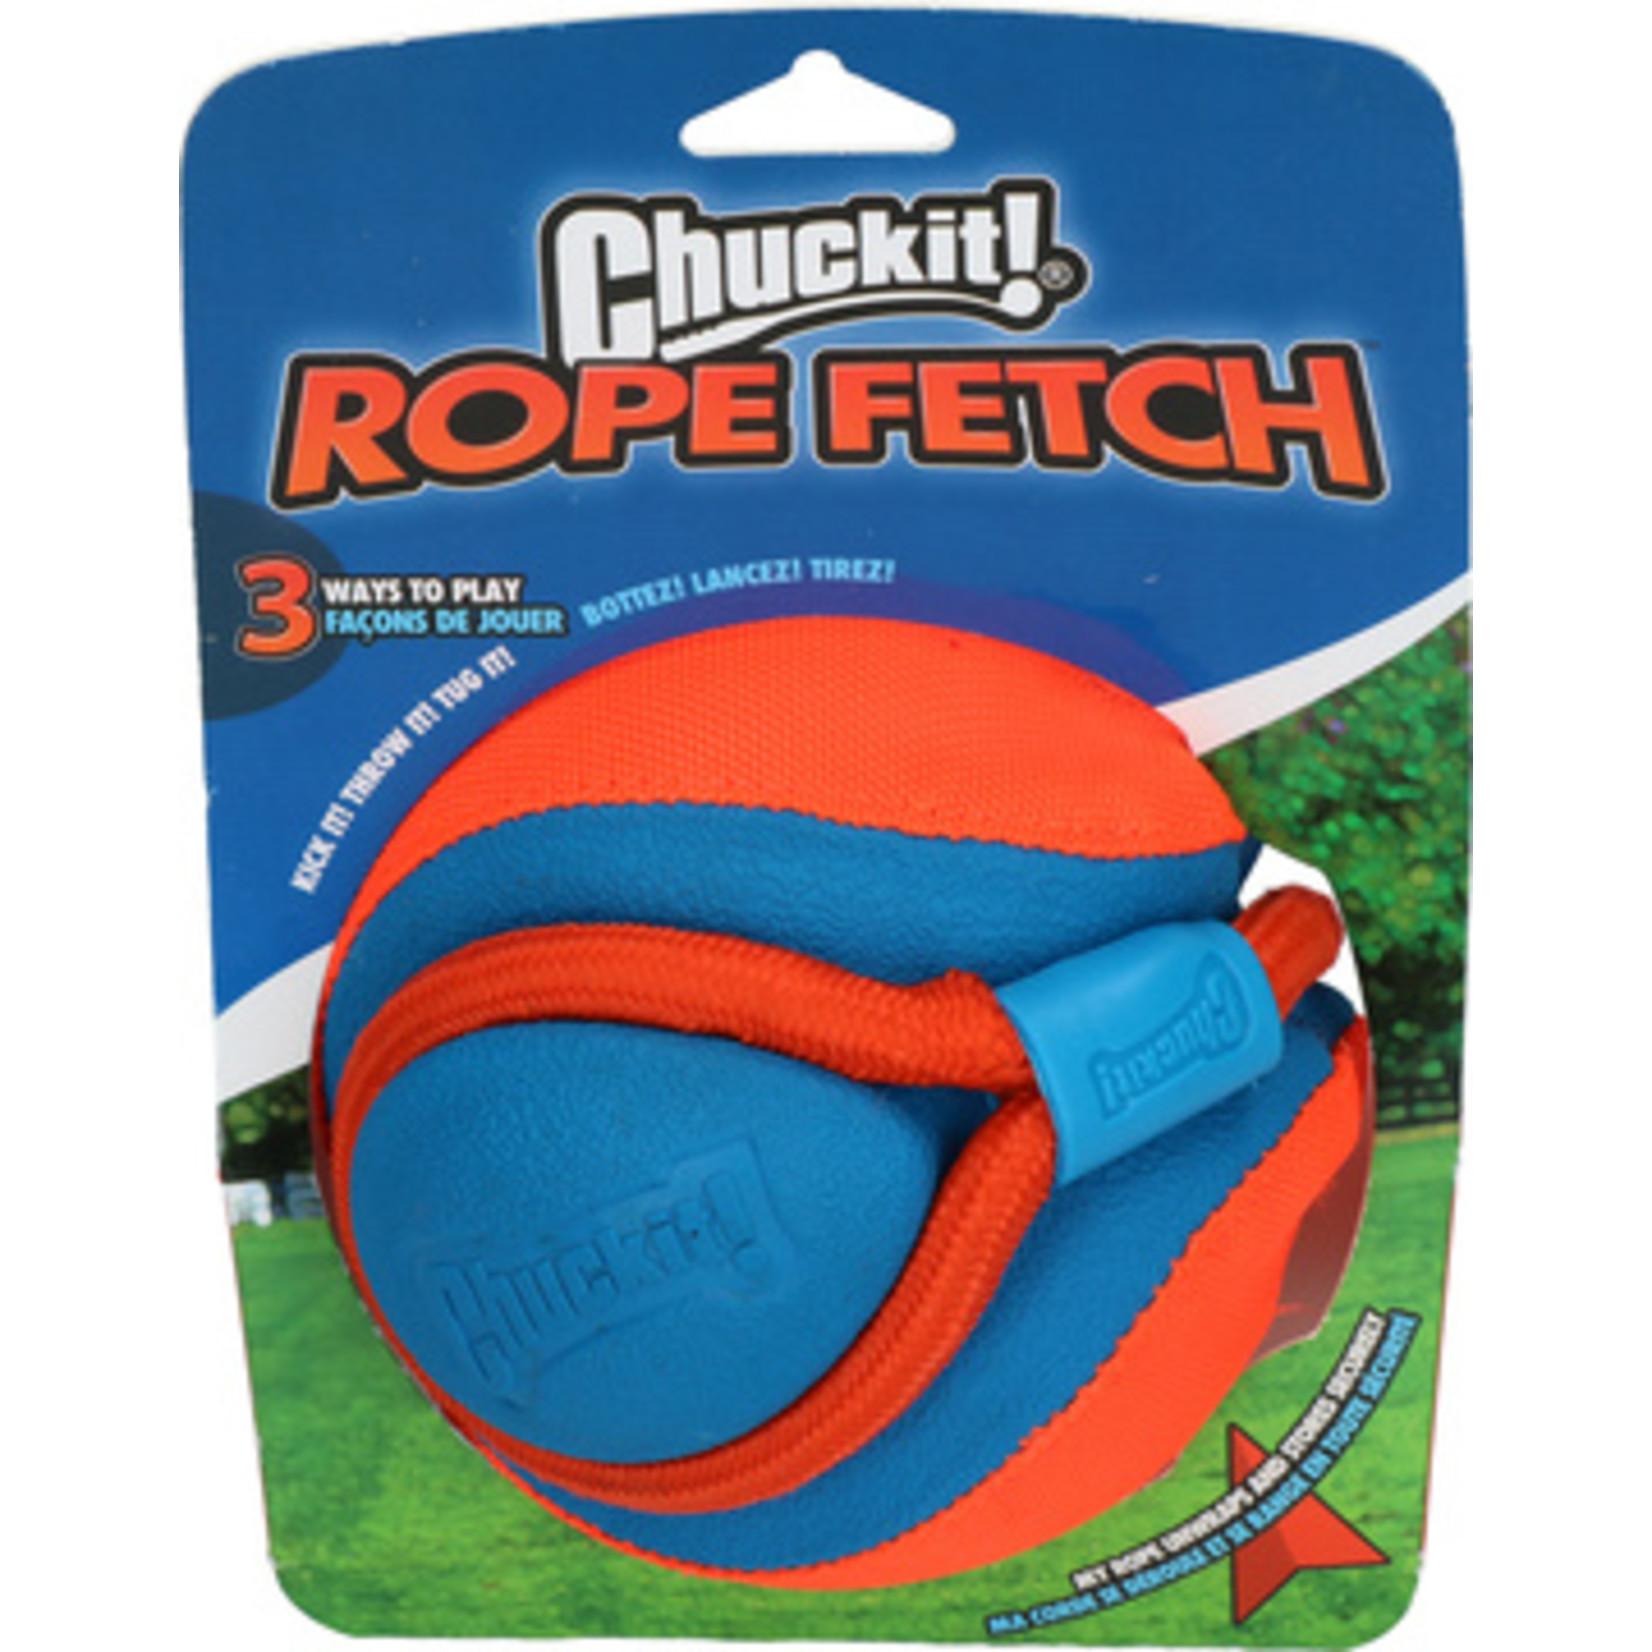 Chuckit Chucit Rope Fetch